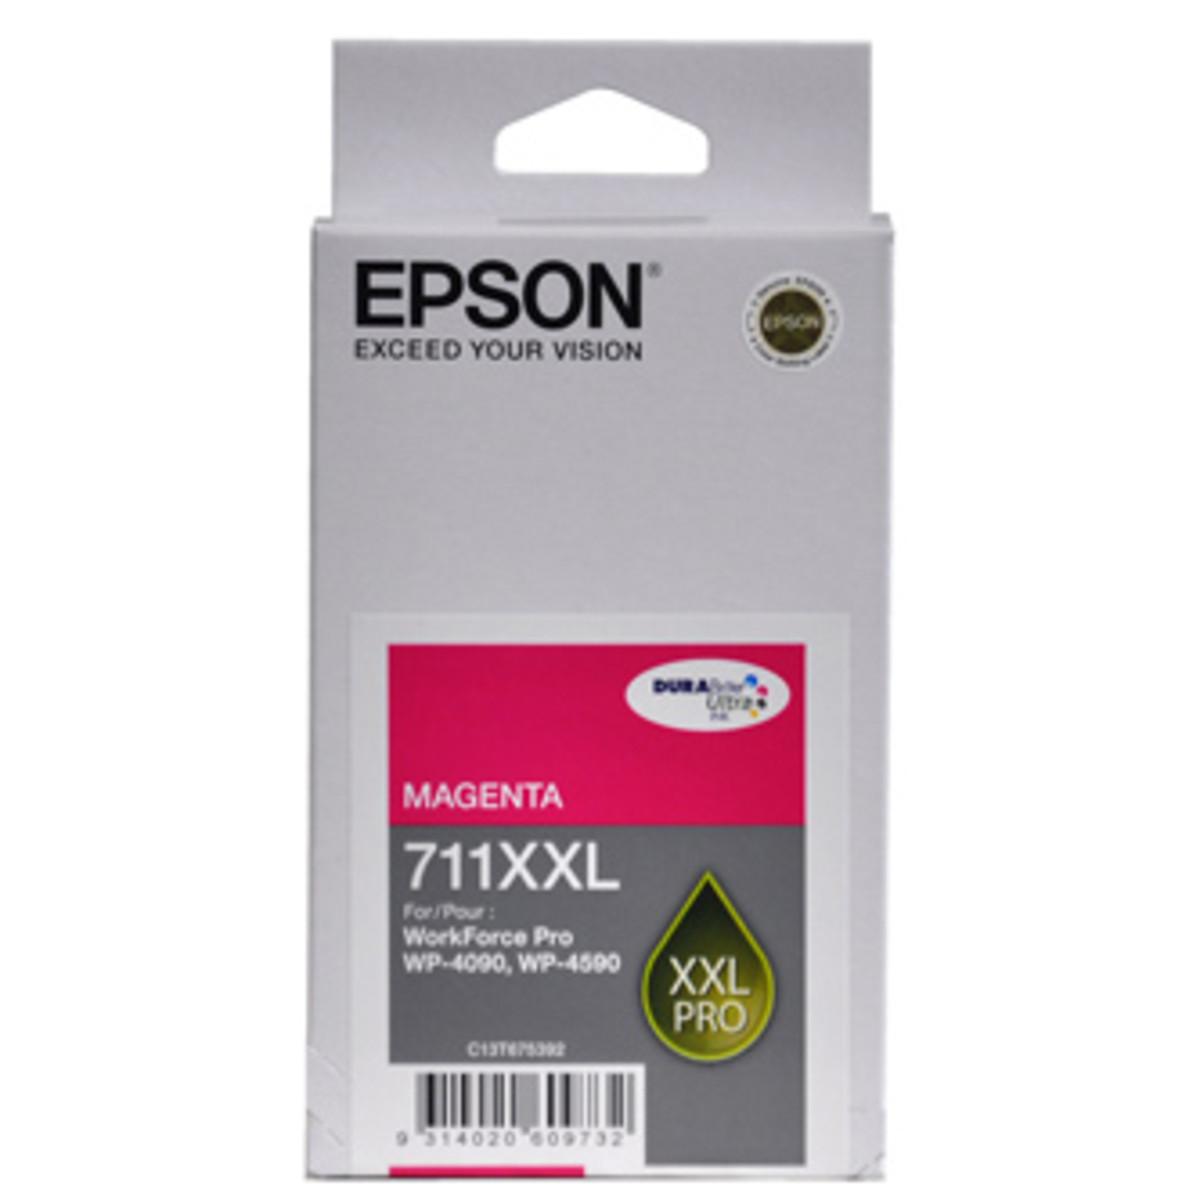 Epson 711XXL Magenta Ink Cartridge - High Yield